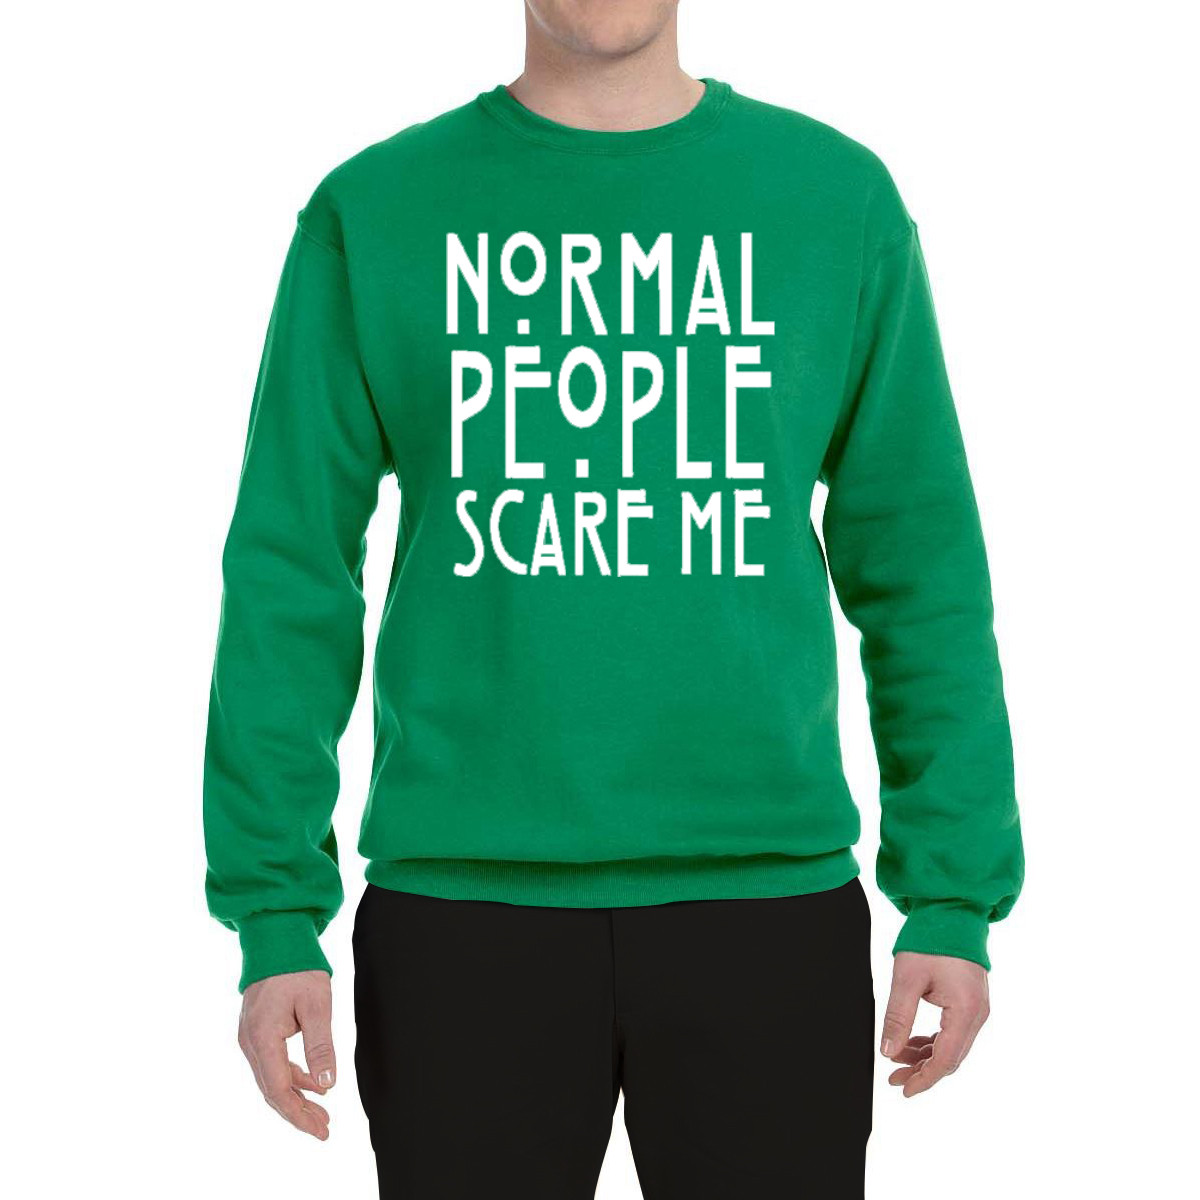 Normal People Scare Me Mens Crewneck Sweatshirt Graphic Sweater